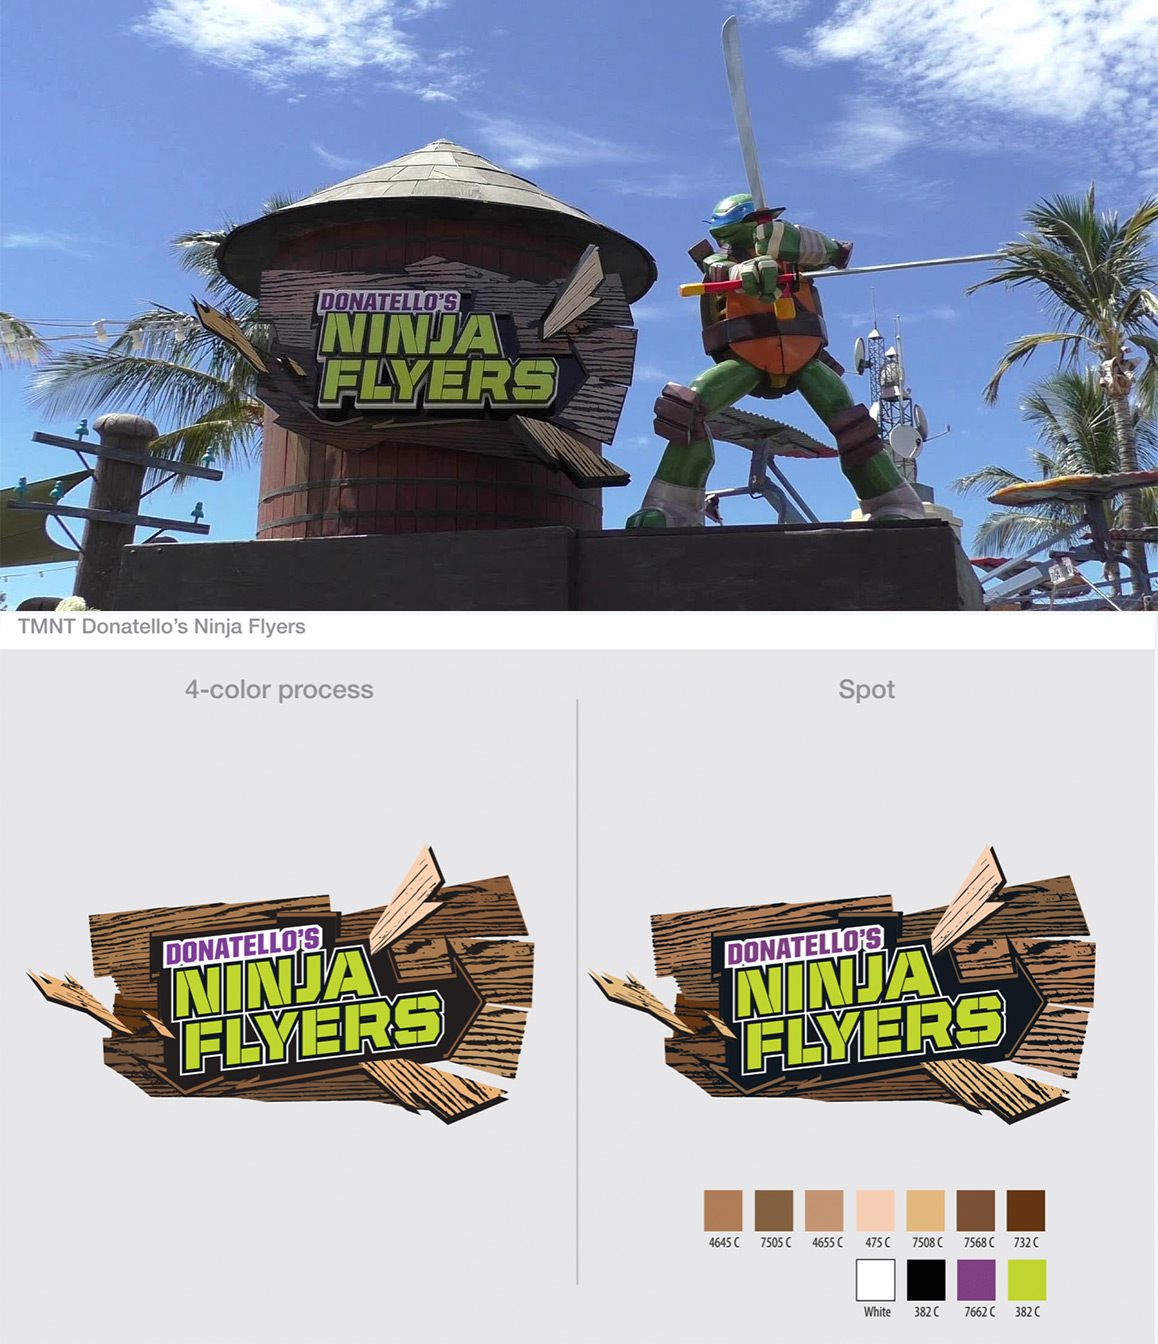 TMNT Ninja Flyers I.D. Sign